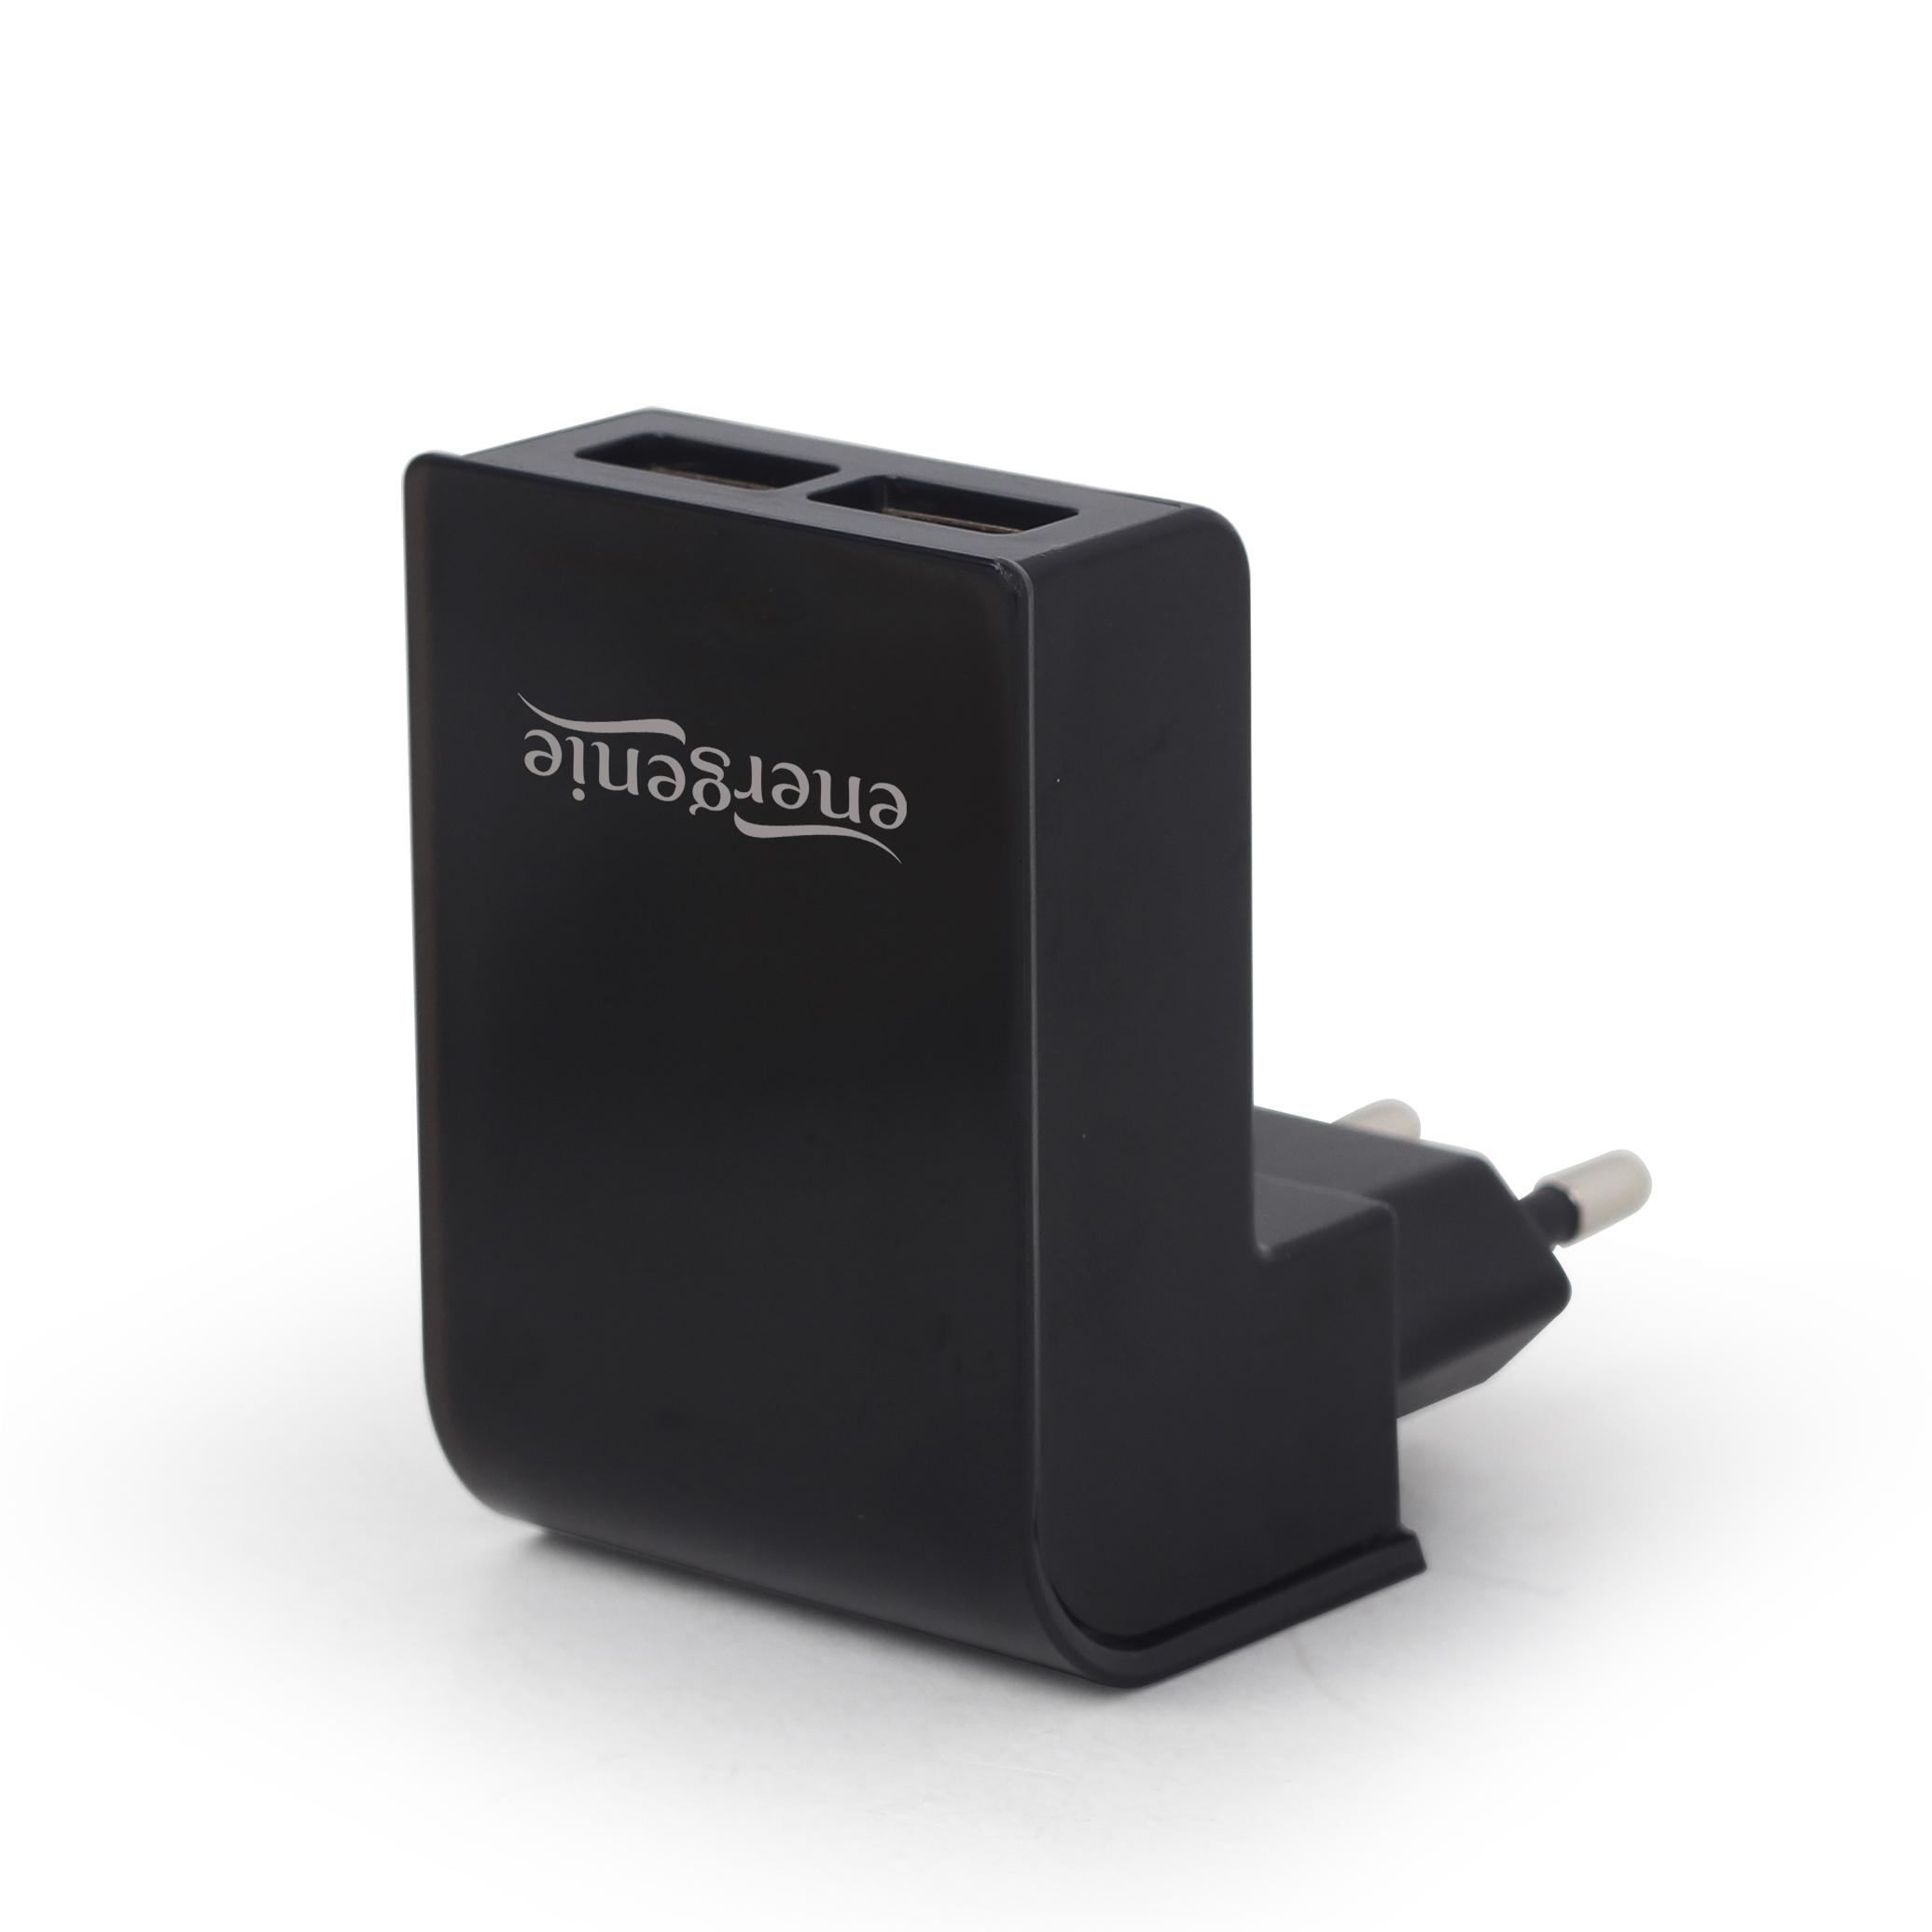 Energenie Universele USB lader, 2X USB, 2.1A, zwart